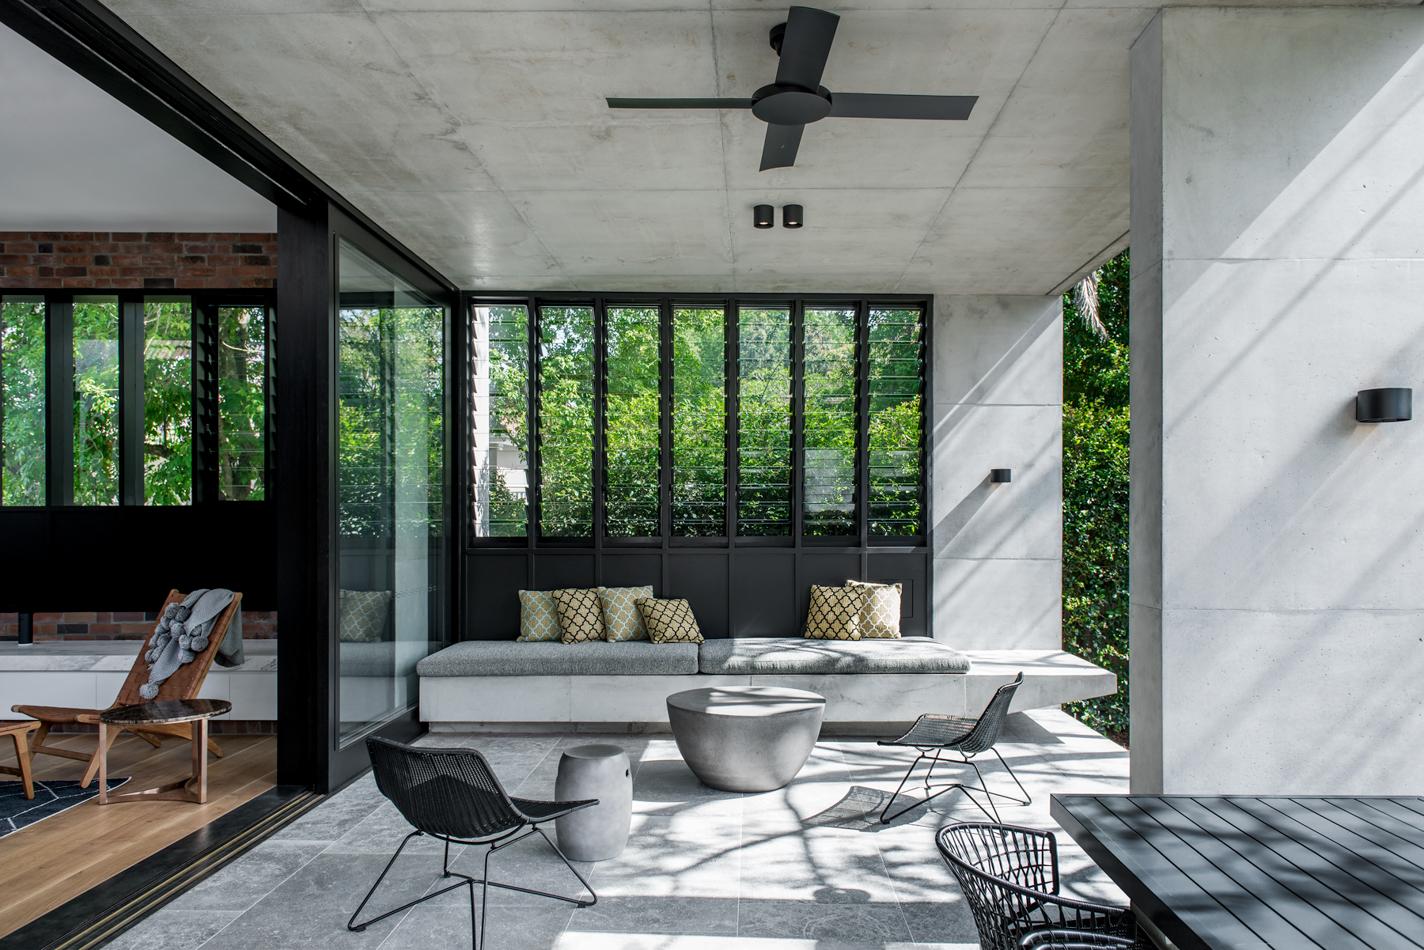 the-terrace-shaun-lockyer-architects-the-design-emotive-11.jpg